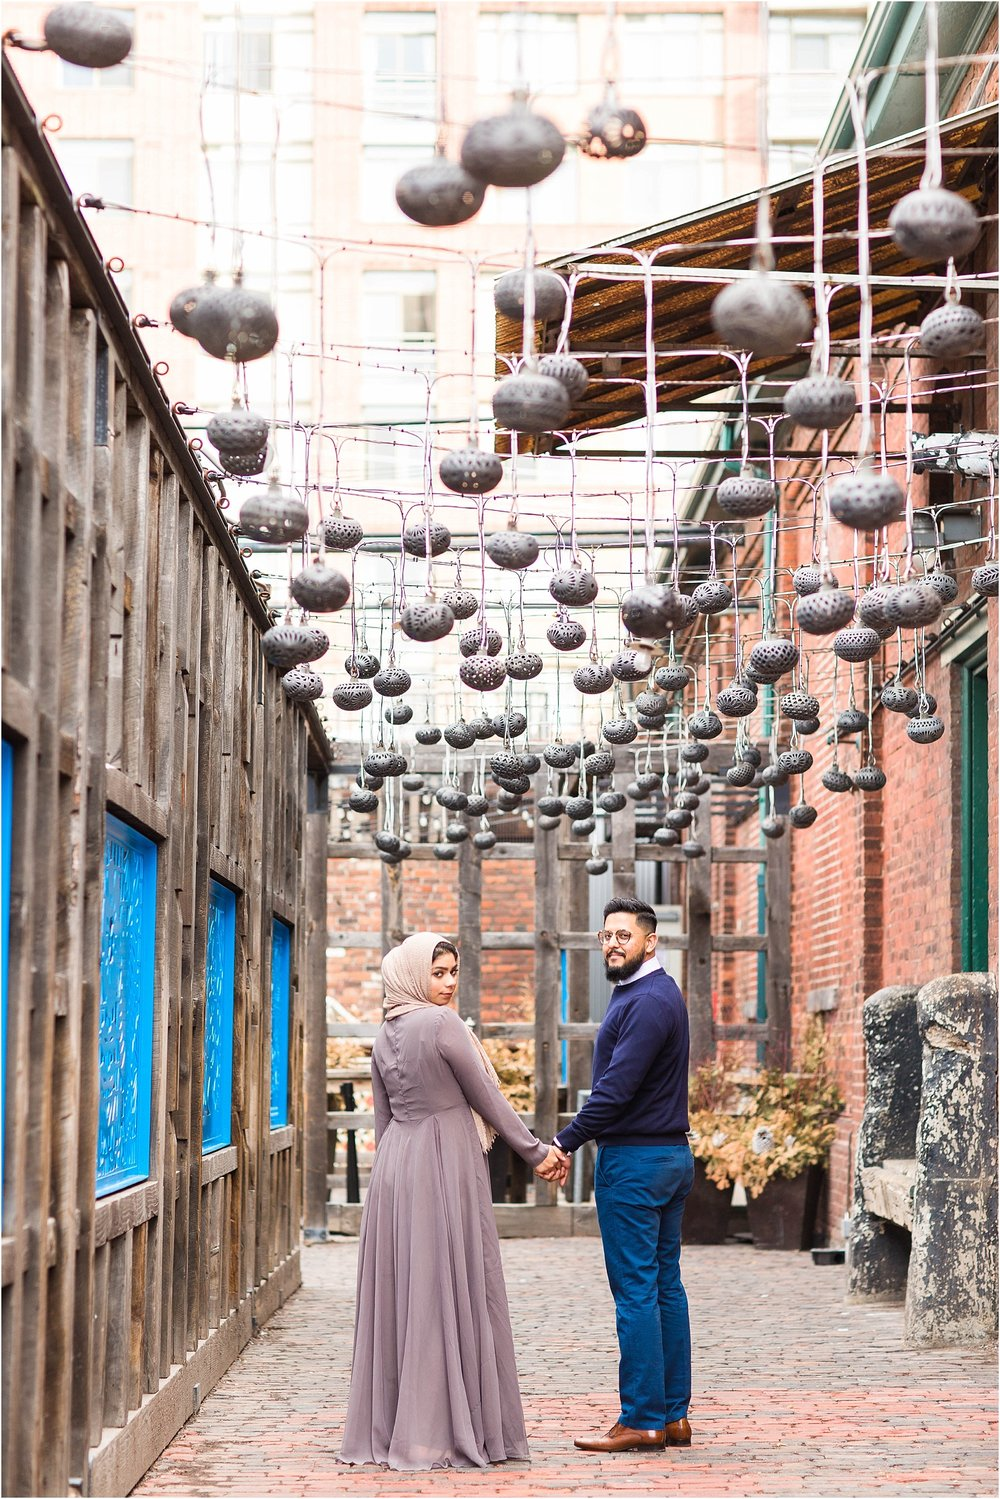 Polson-Pier-Distillery-District-Engagement-Session-Toronto-Mississauga-Brampton-Scarborough-GTA-Pakistani-Indian-Wedding-Engagement-Photographer-Photography_0049.jpg